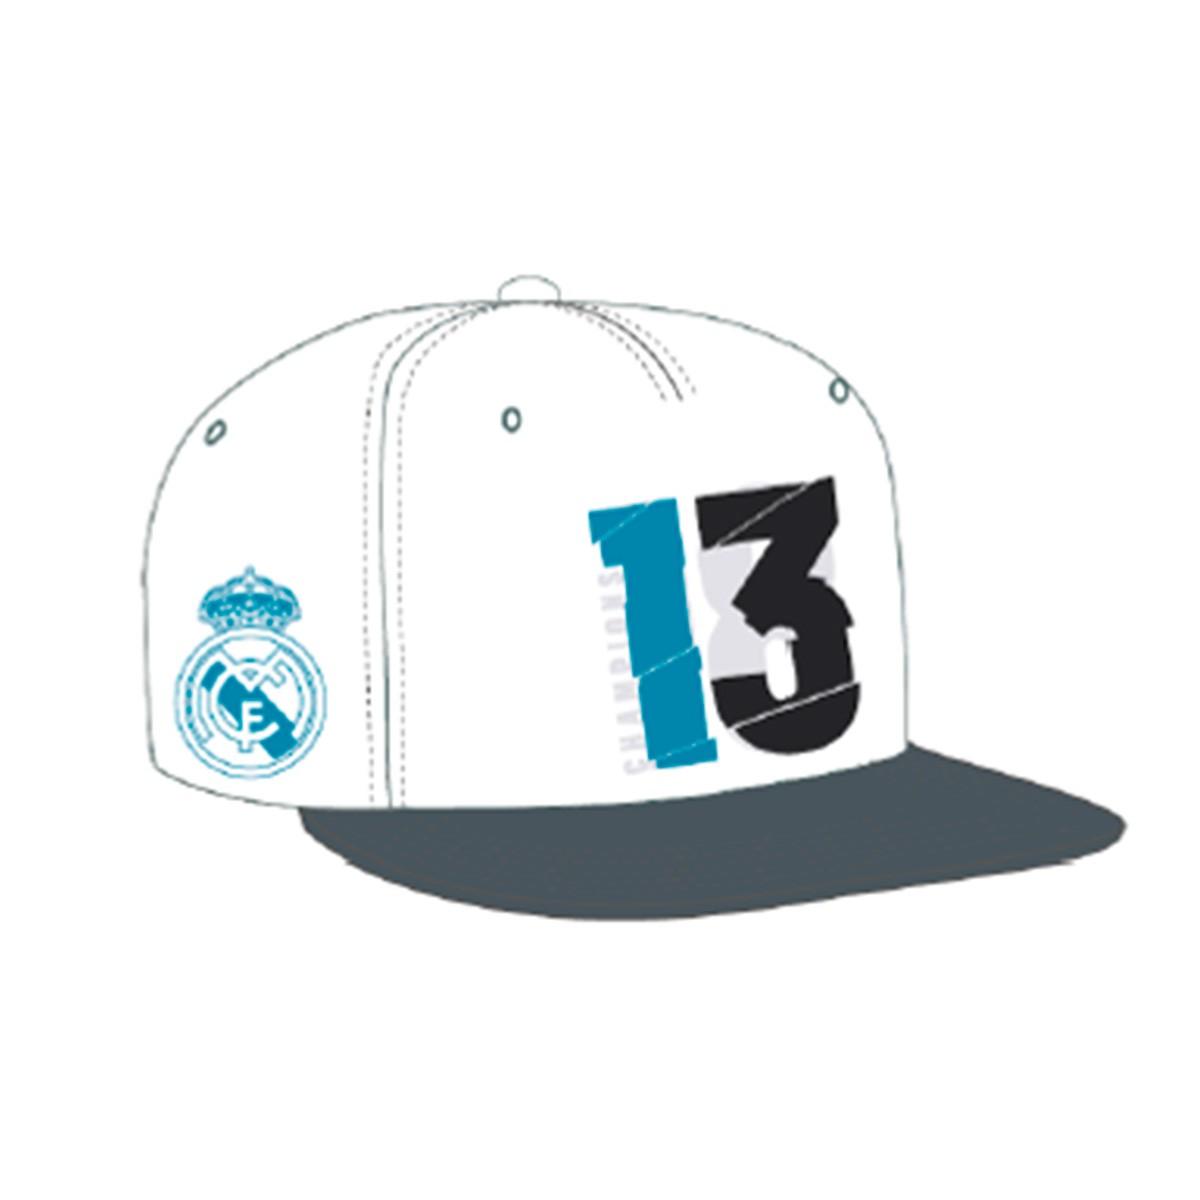 47242e73f04481 Gorra adidas Real Madrid 13 Campeón UCL 18 White - Tienda de fútbol Fútbol  Emotion